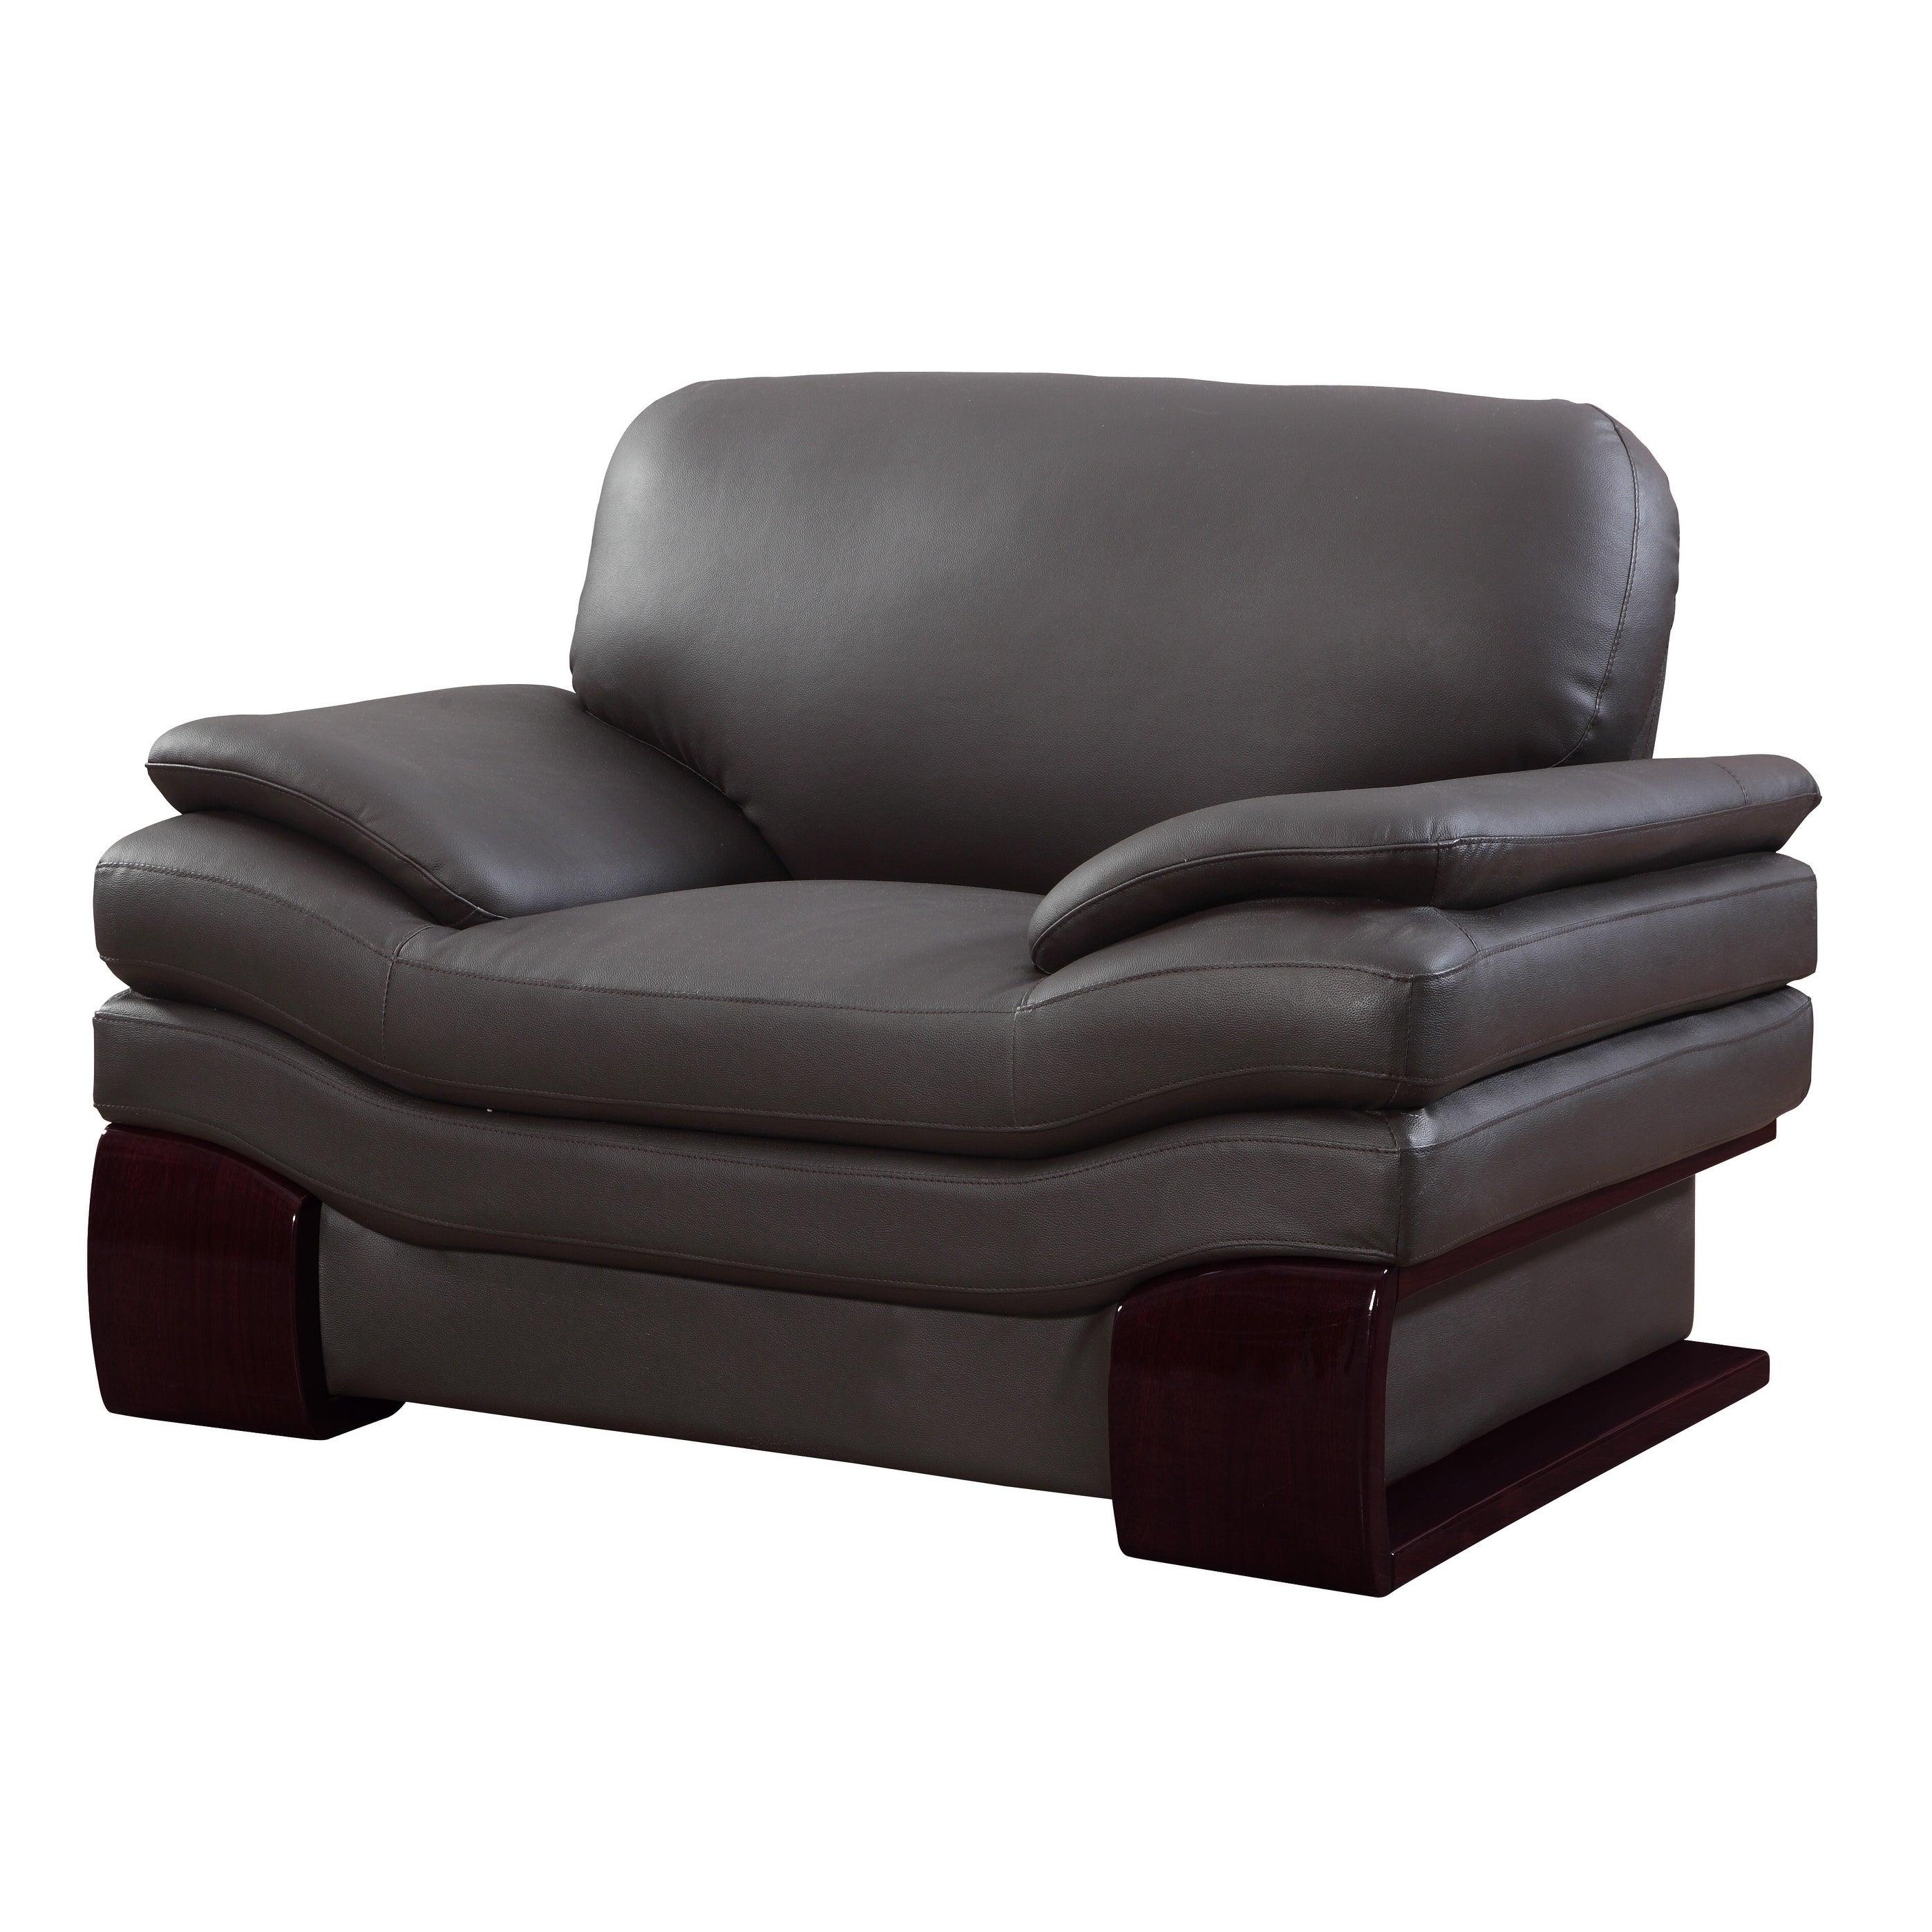 Ellington Leather Match Upholstered 2 Piece Living Room Sofa Set